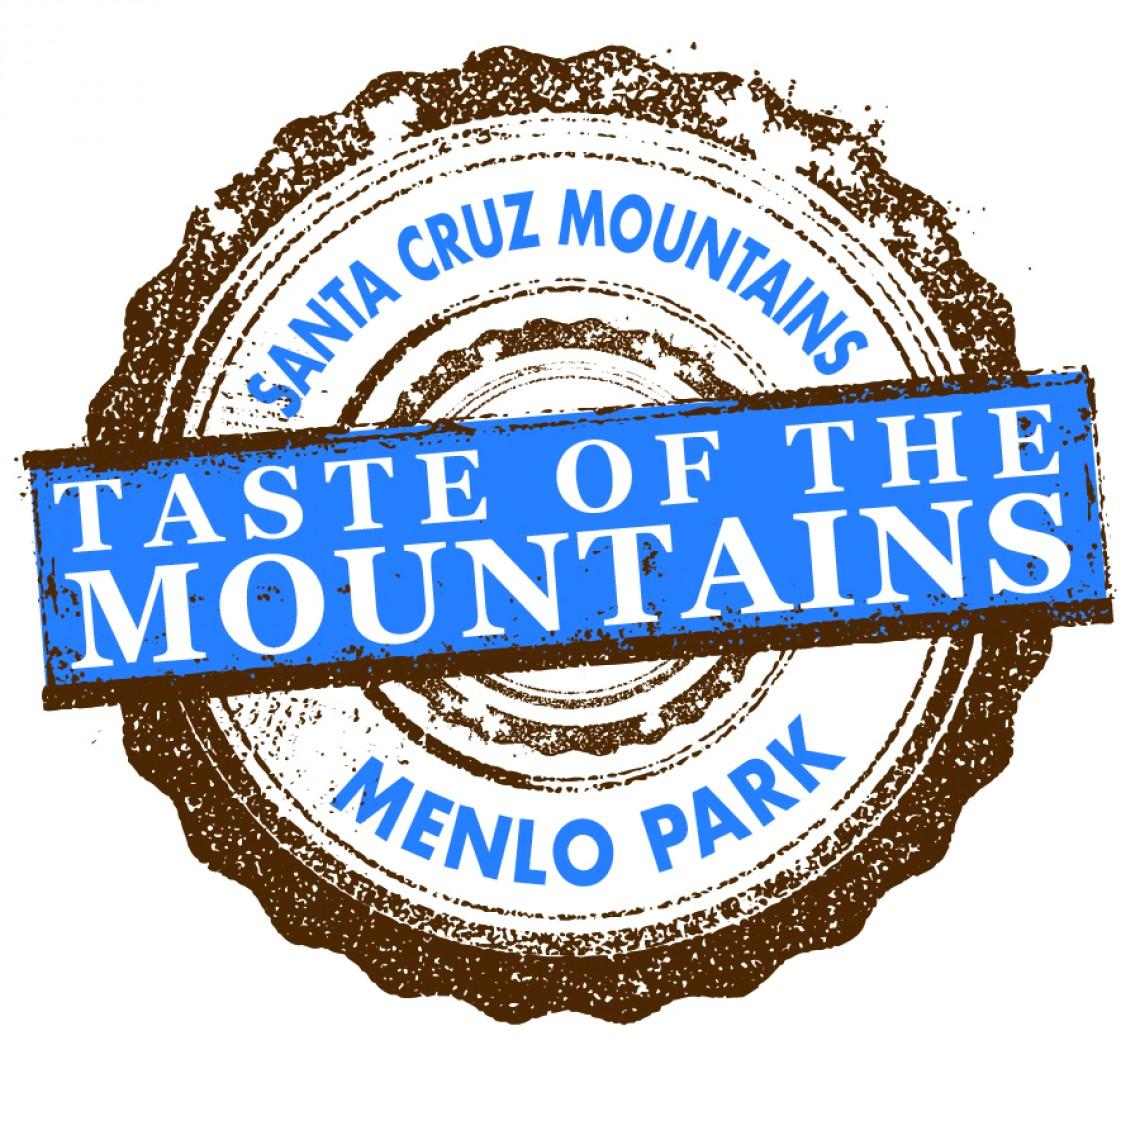 Taste of the Mountains – Menlo Park